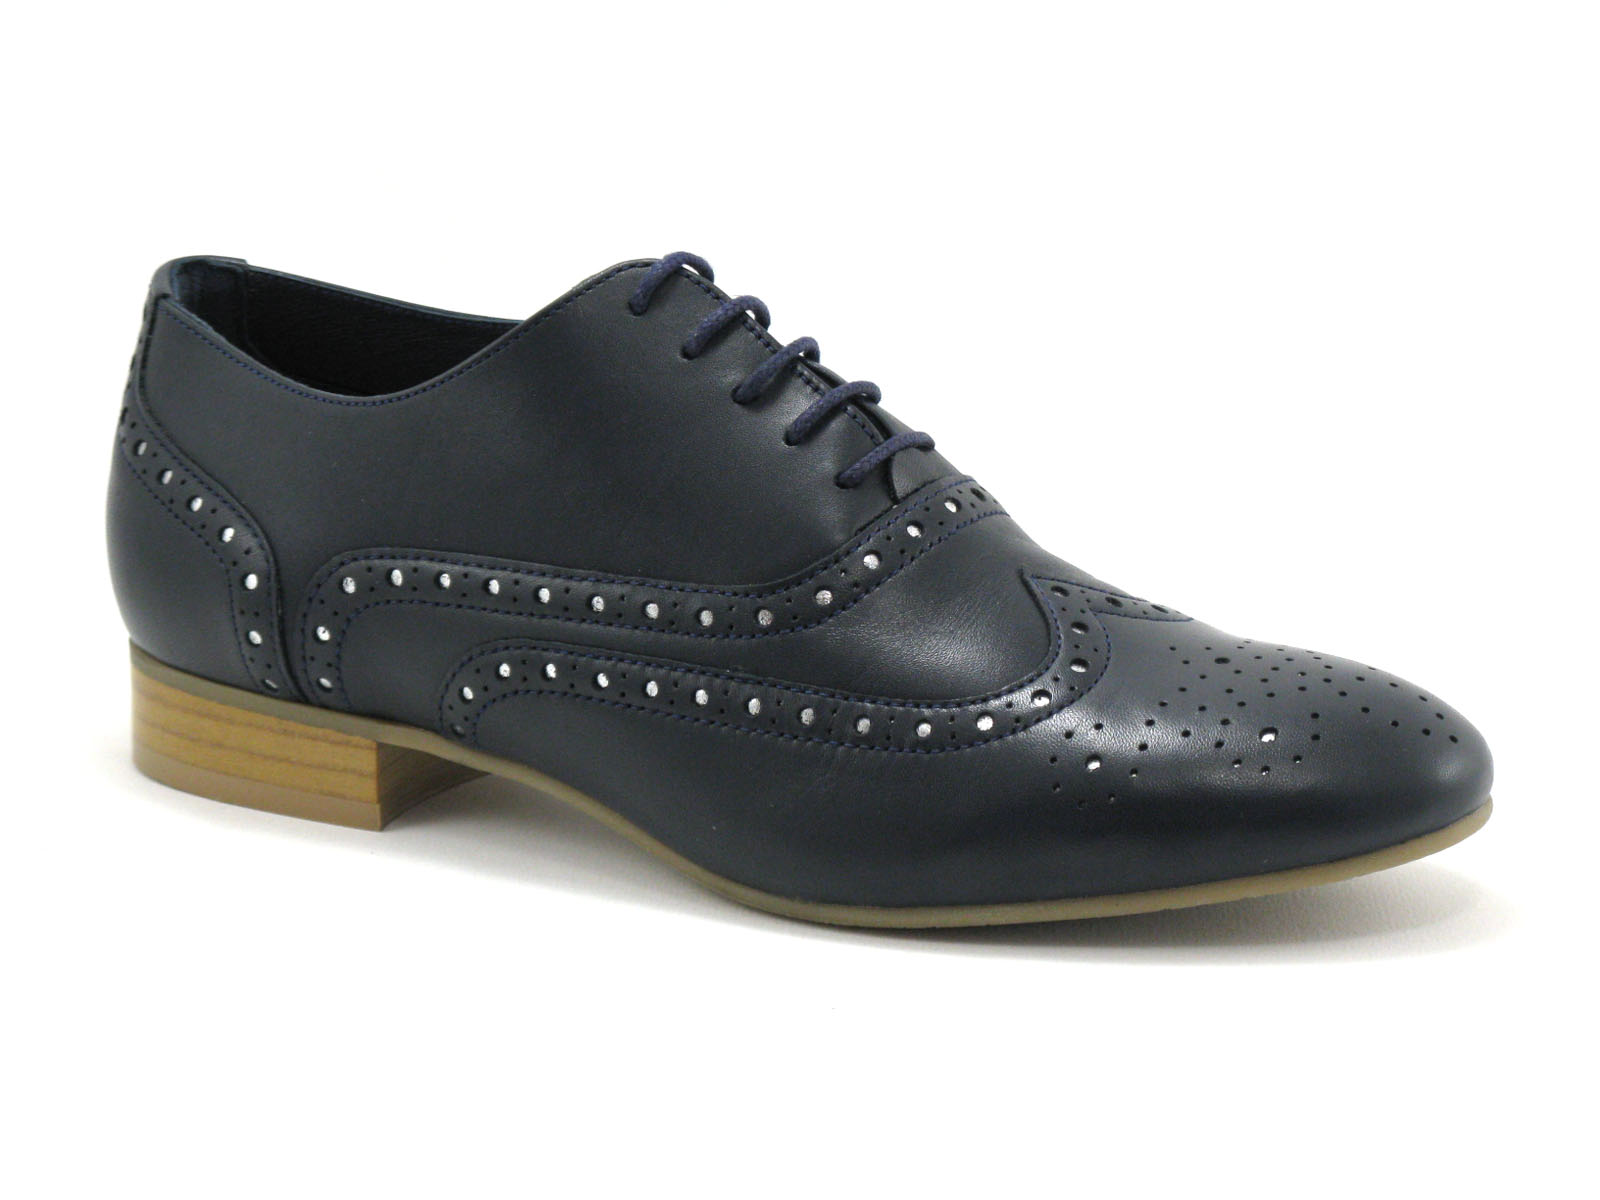 chaussures de marche femme elegante. Black Bedroom Furniture Sets. Home Design Ideas